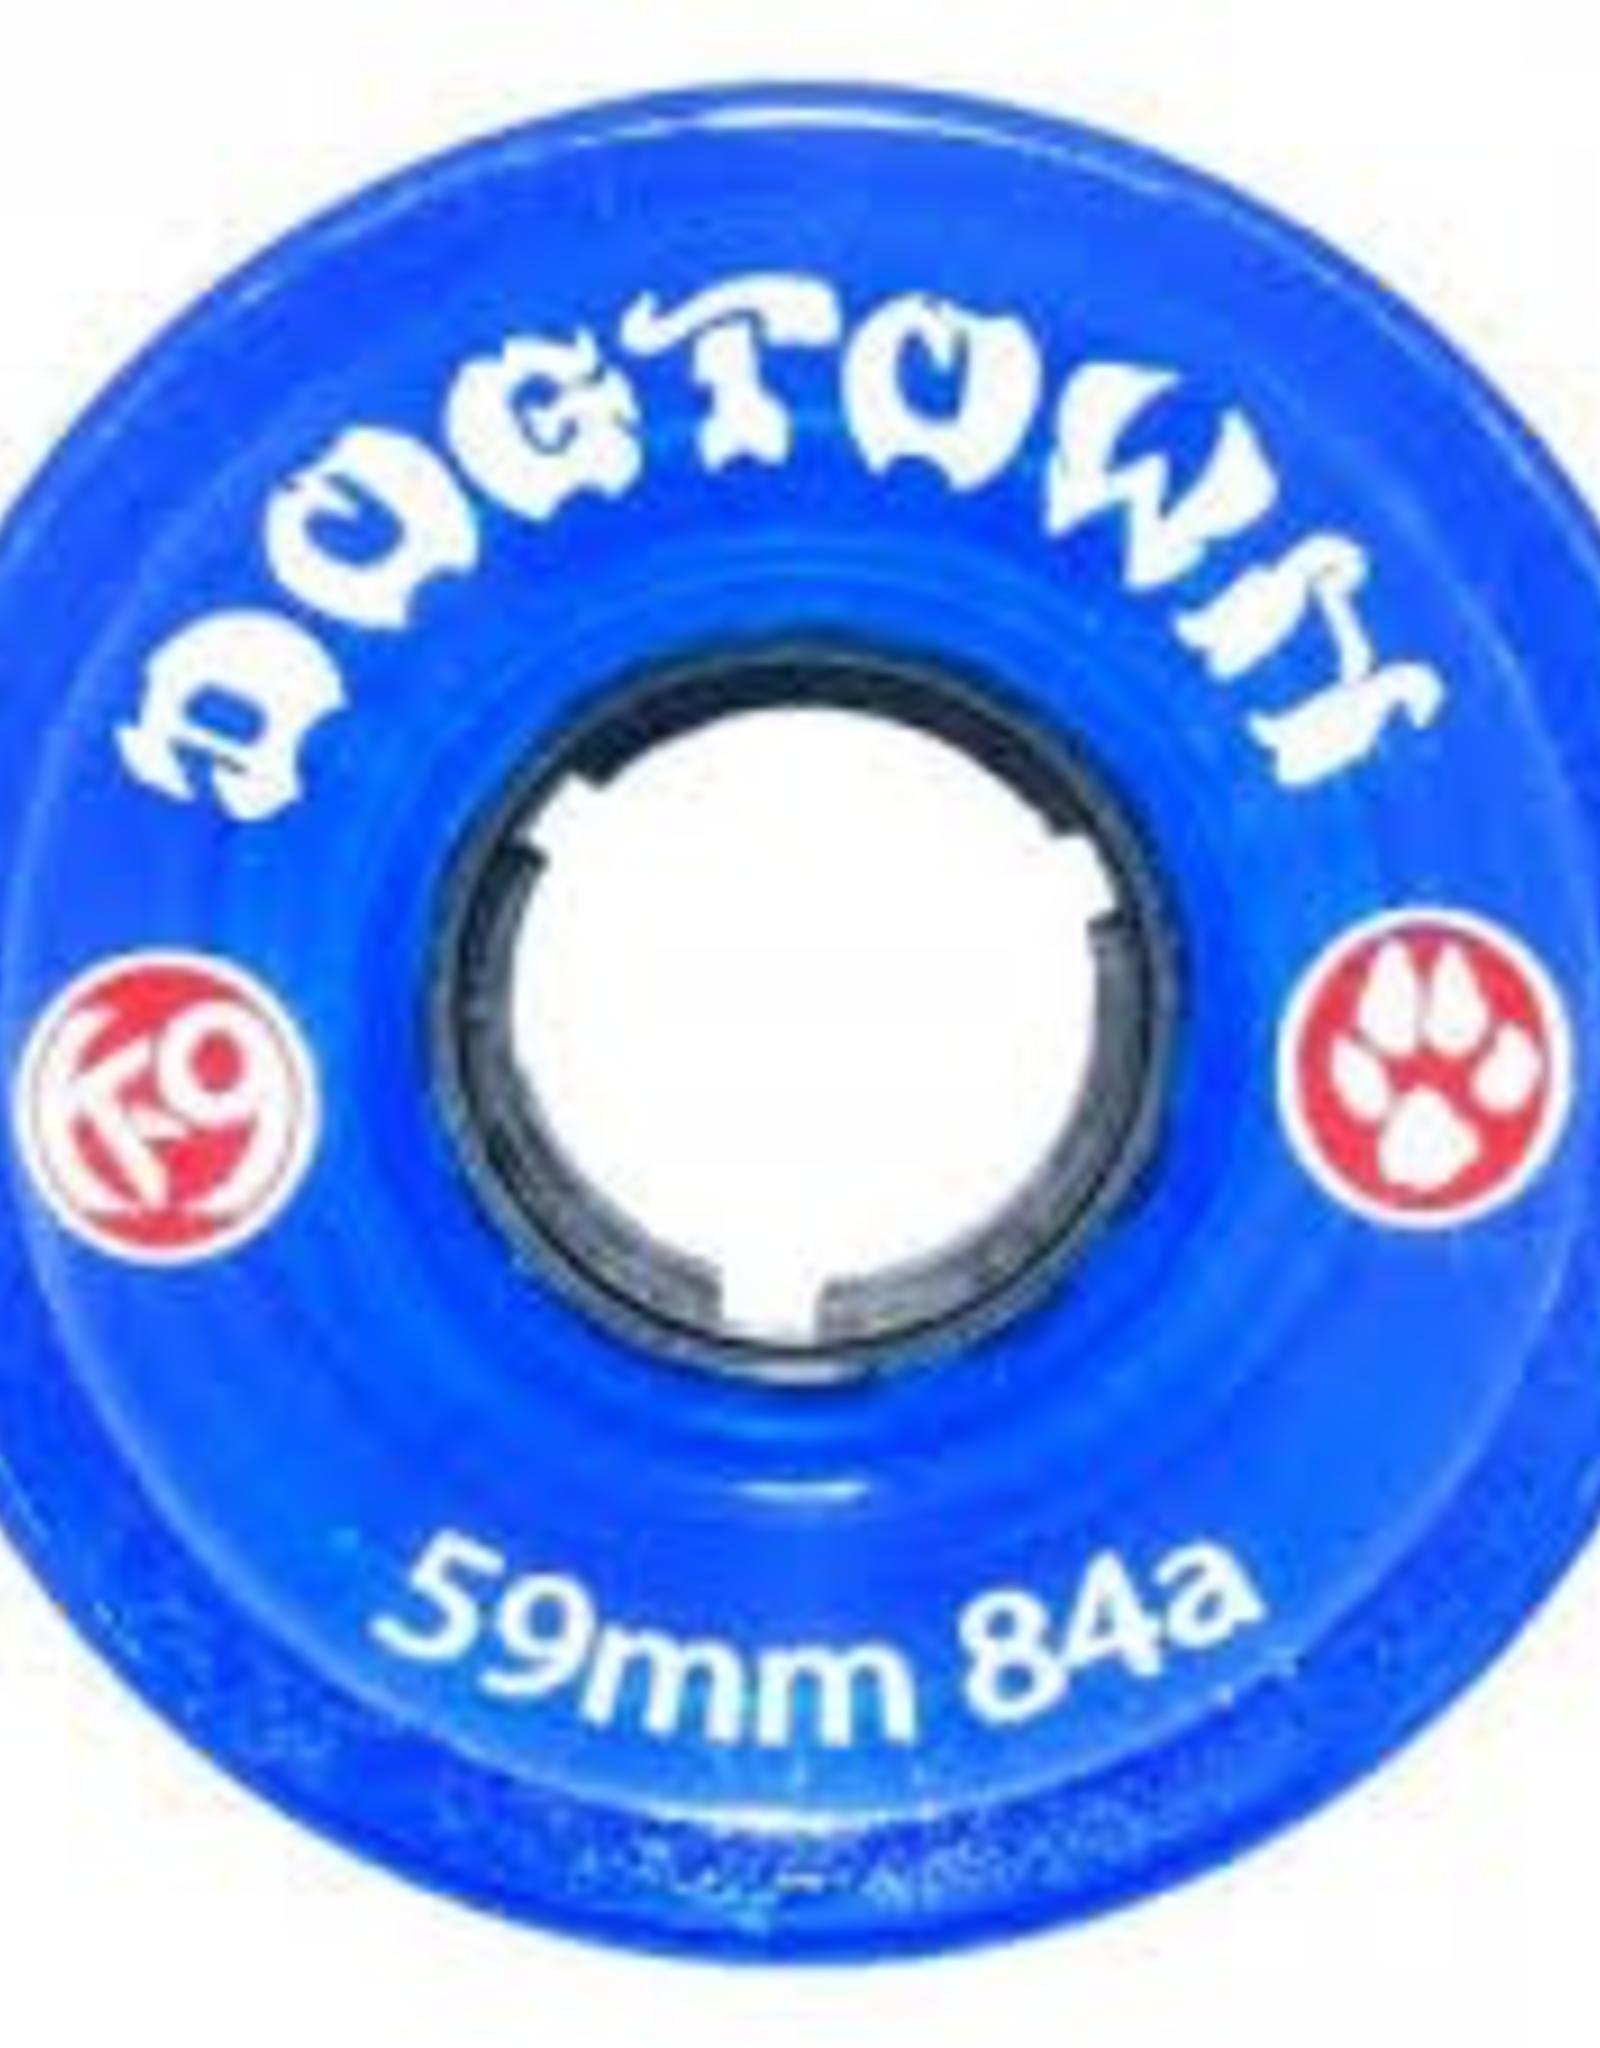 DOGTOWN DOGTOWN K-9 WHEELS 59MM x 84A, CLEAR BLUE